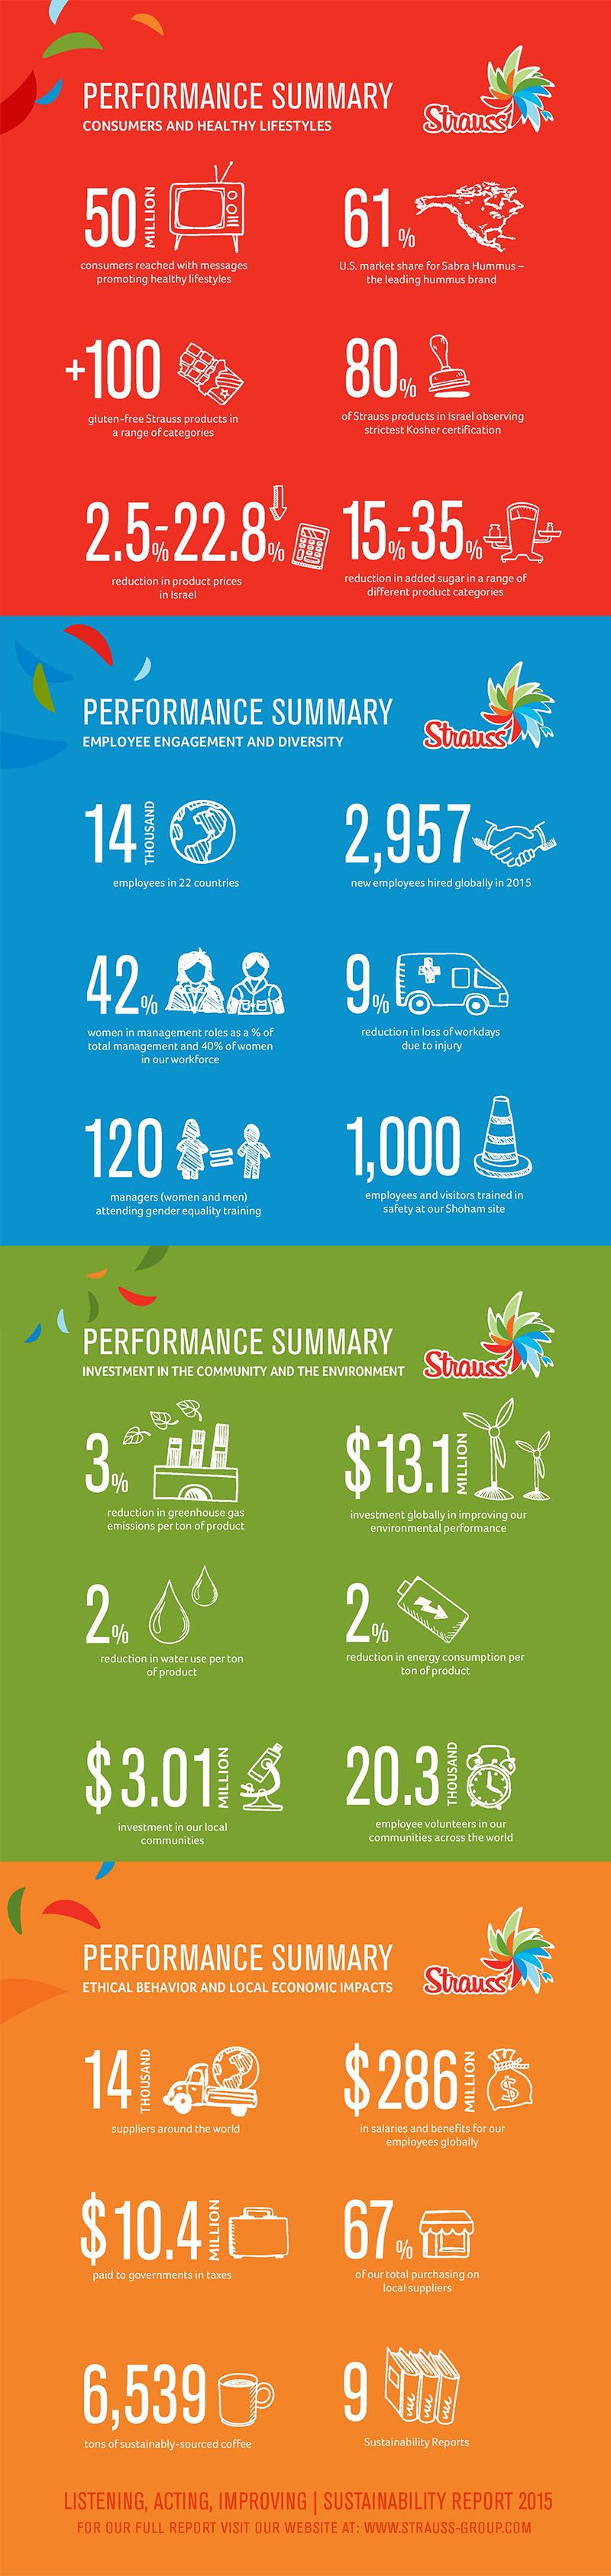 2015-Strauss-Group-Sustainability-Infogrphic